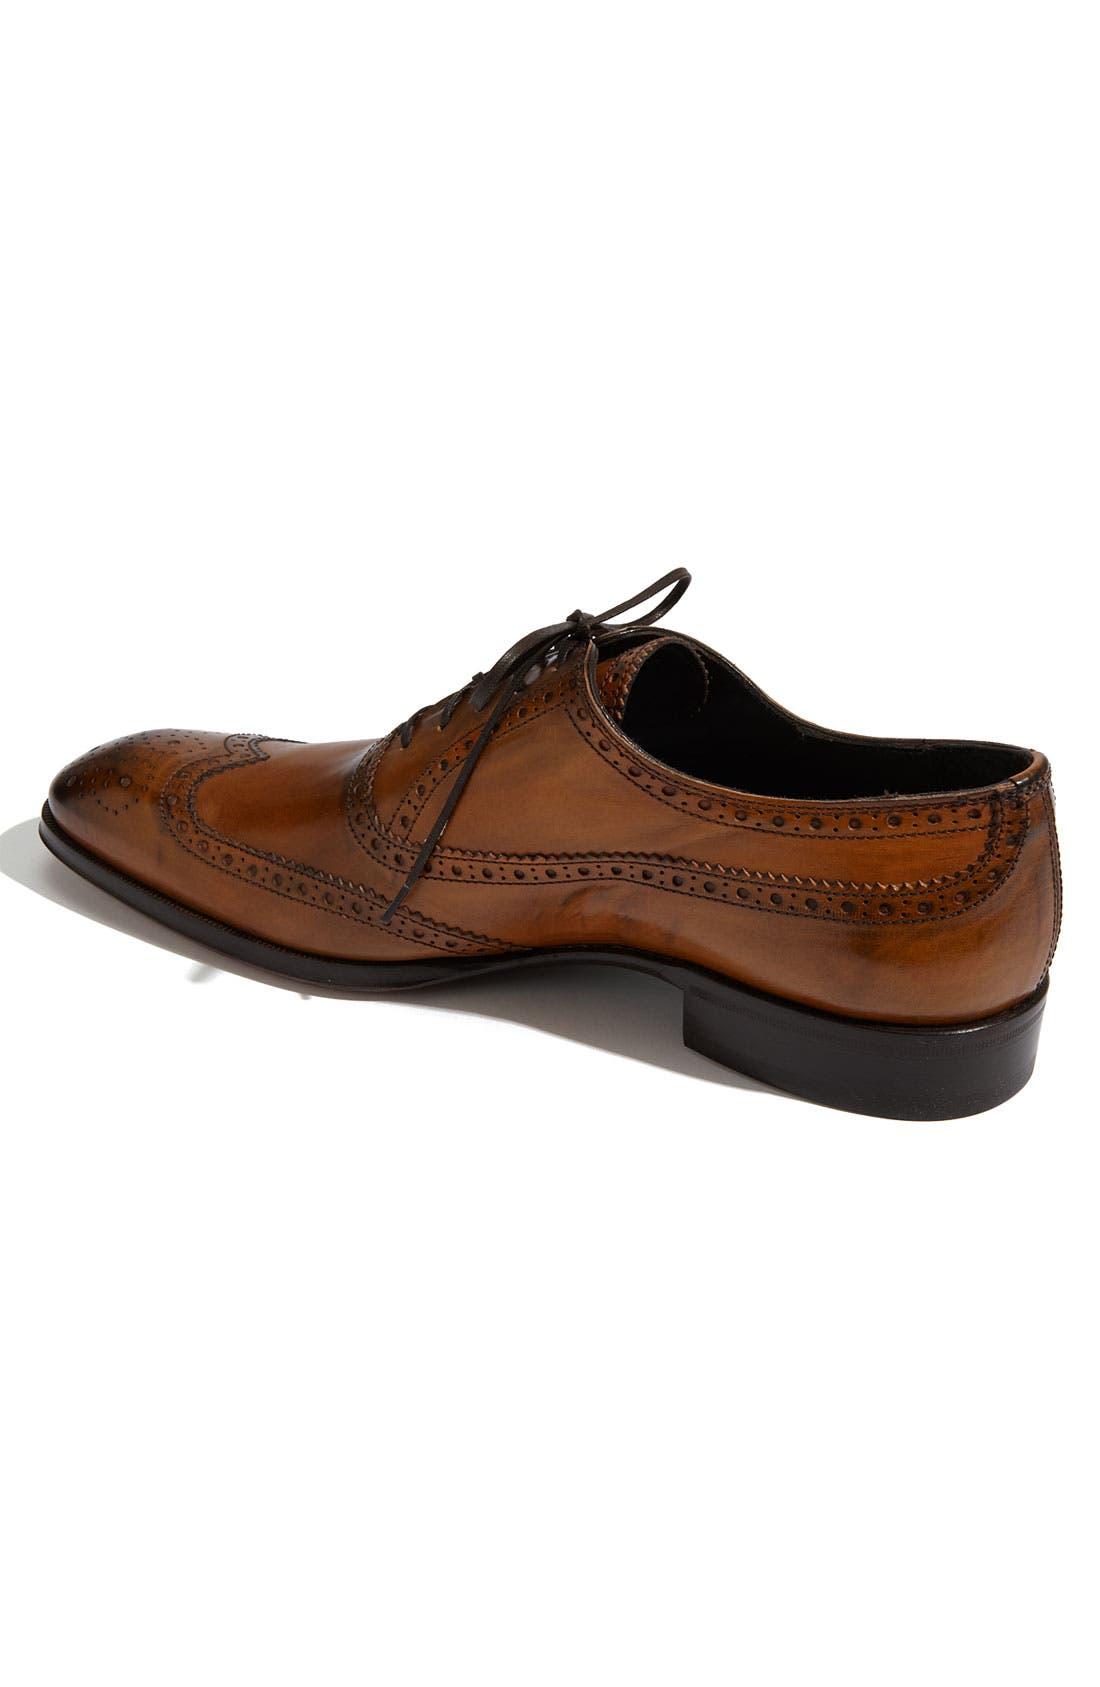 Alternate Image 2  - To Boot New York 'Windsor' Wingtip Oxford (Men)